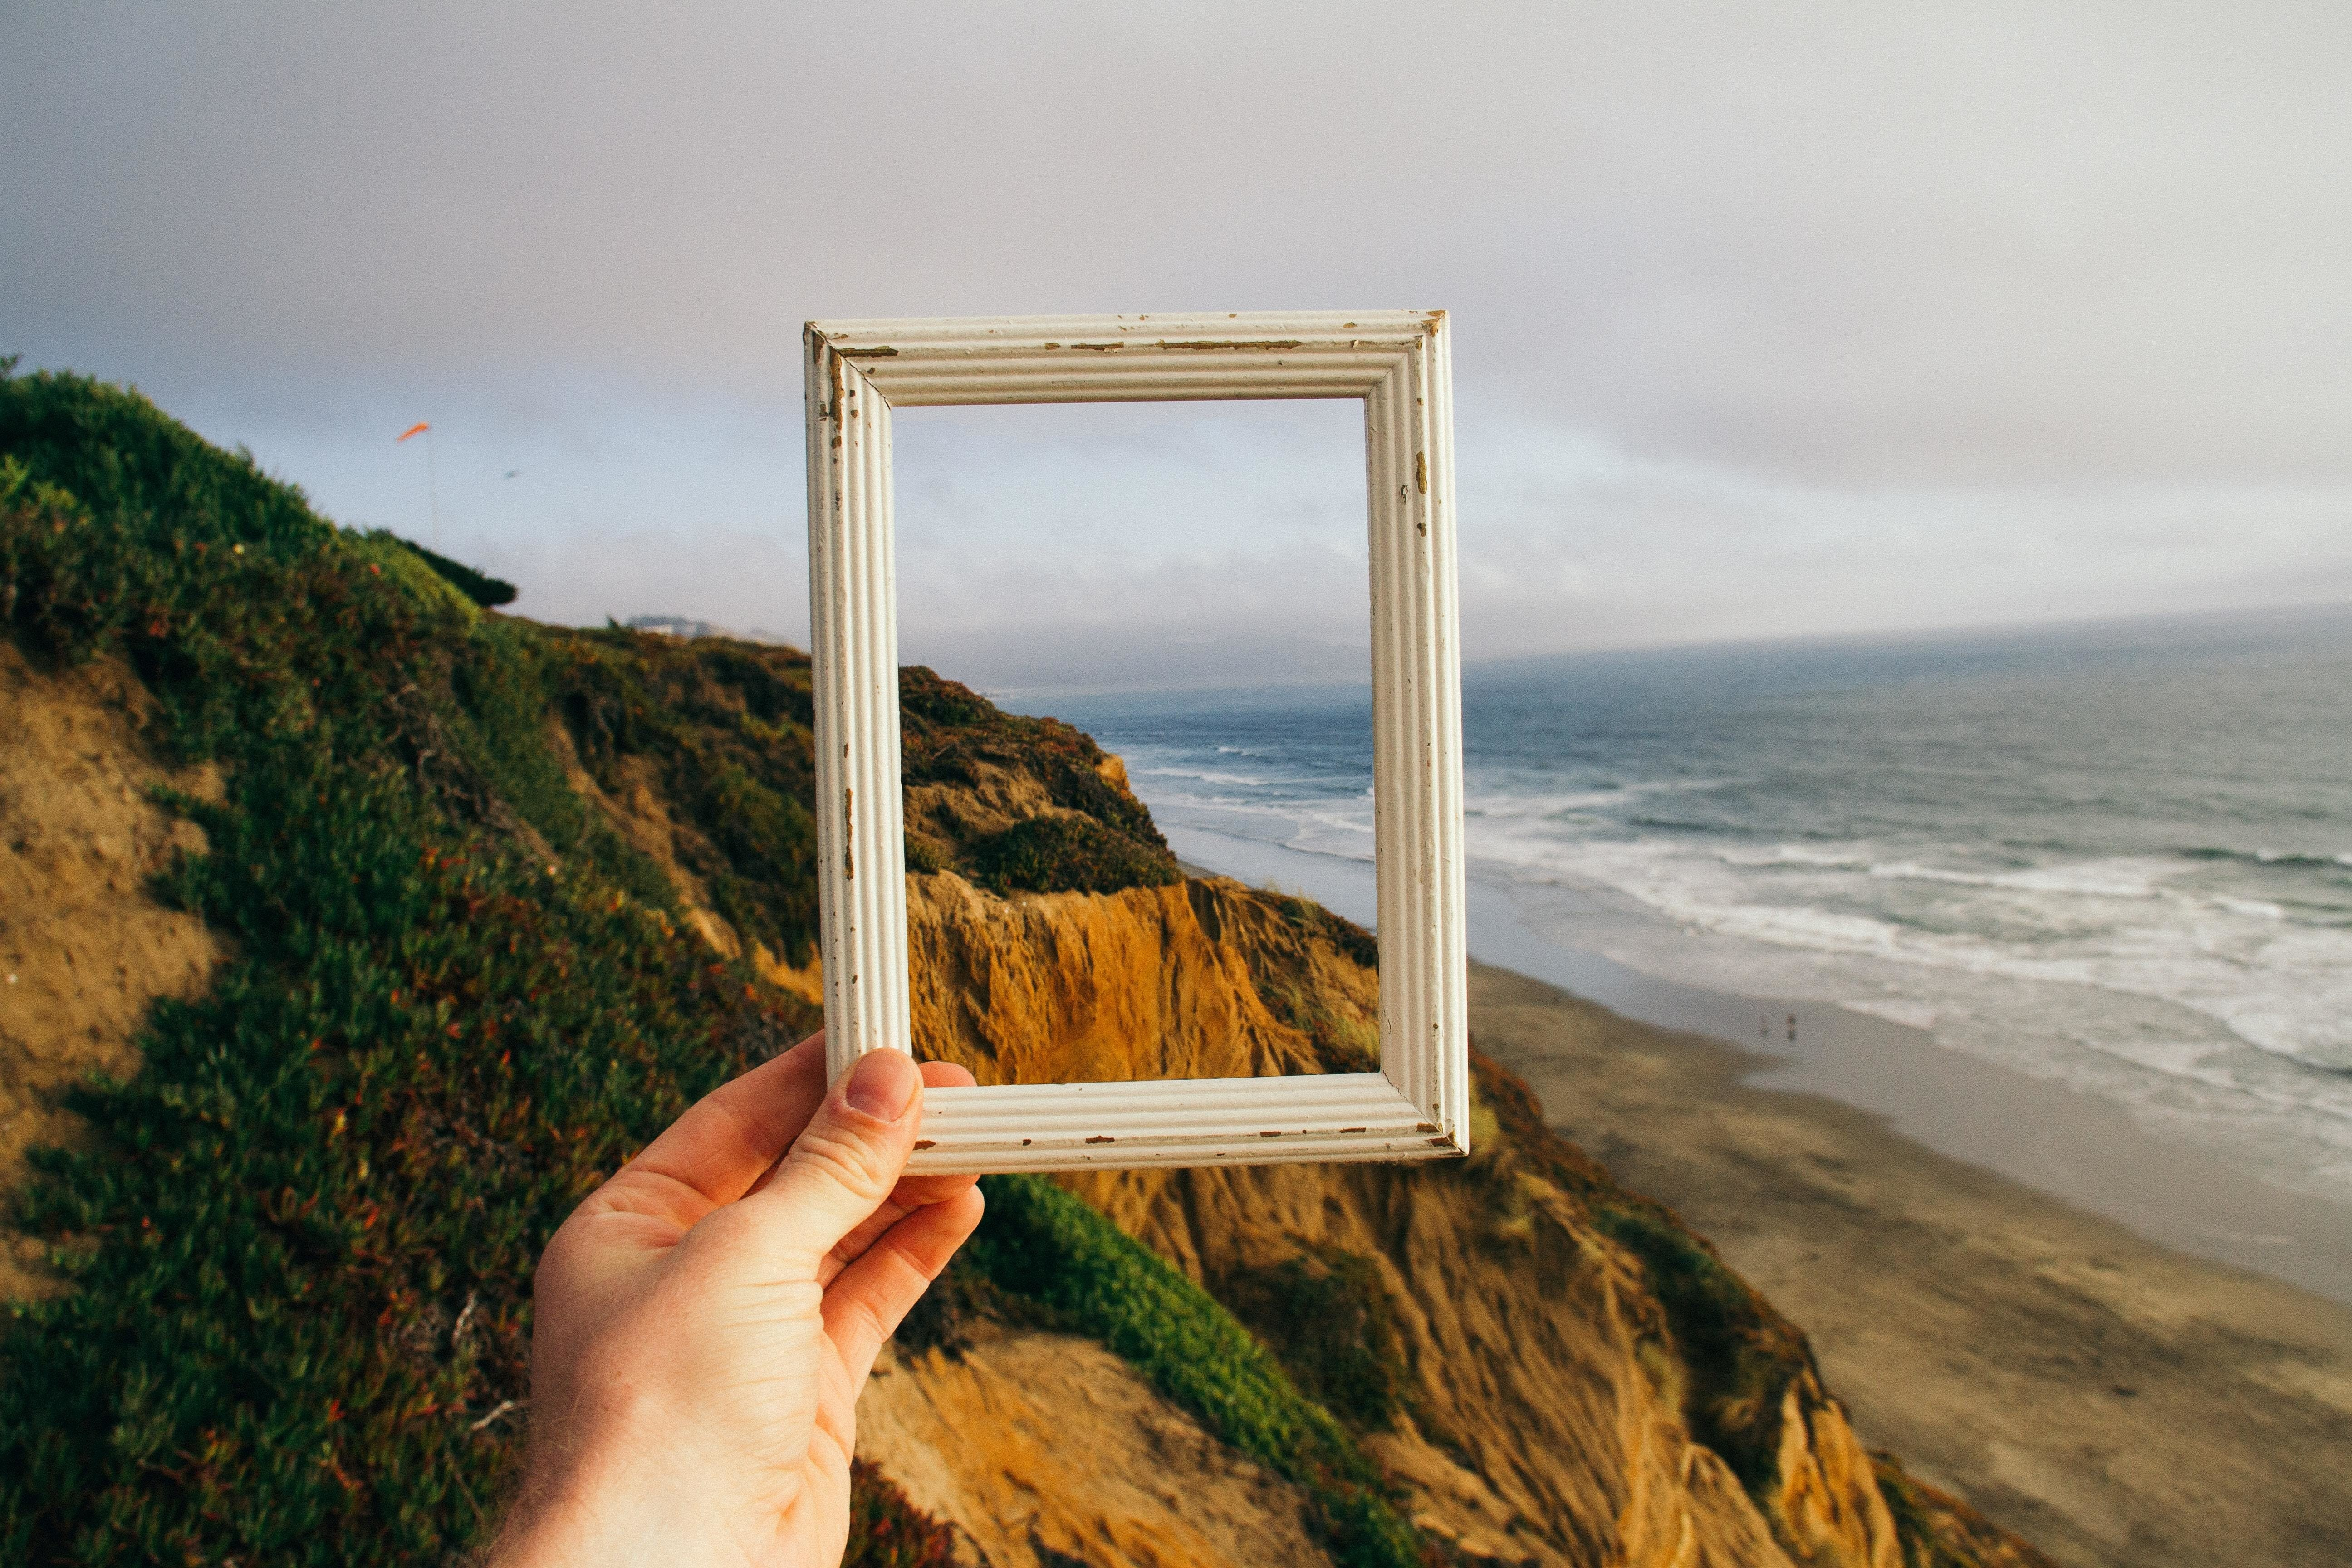 Cliffs, beach and sea scene, hand holding white frame; reframing the scene.